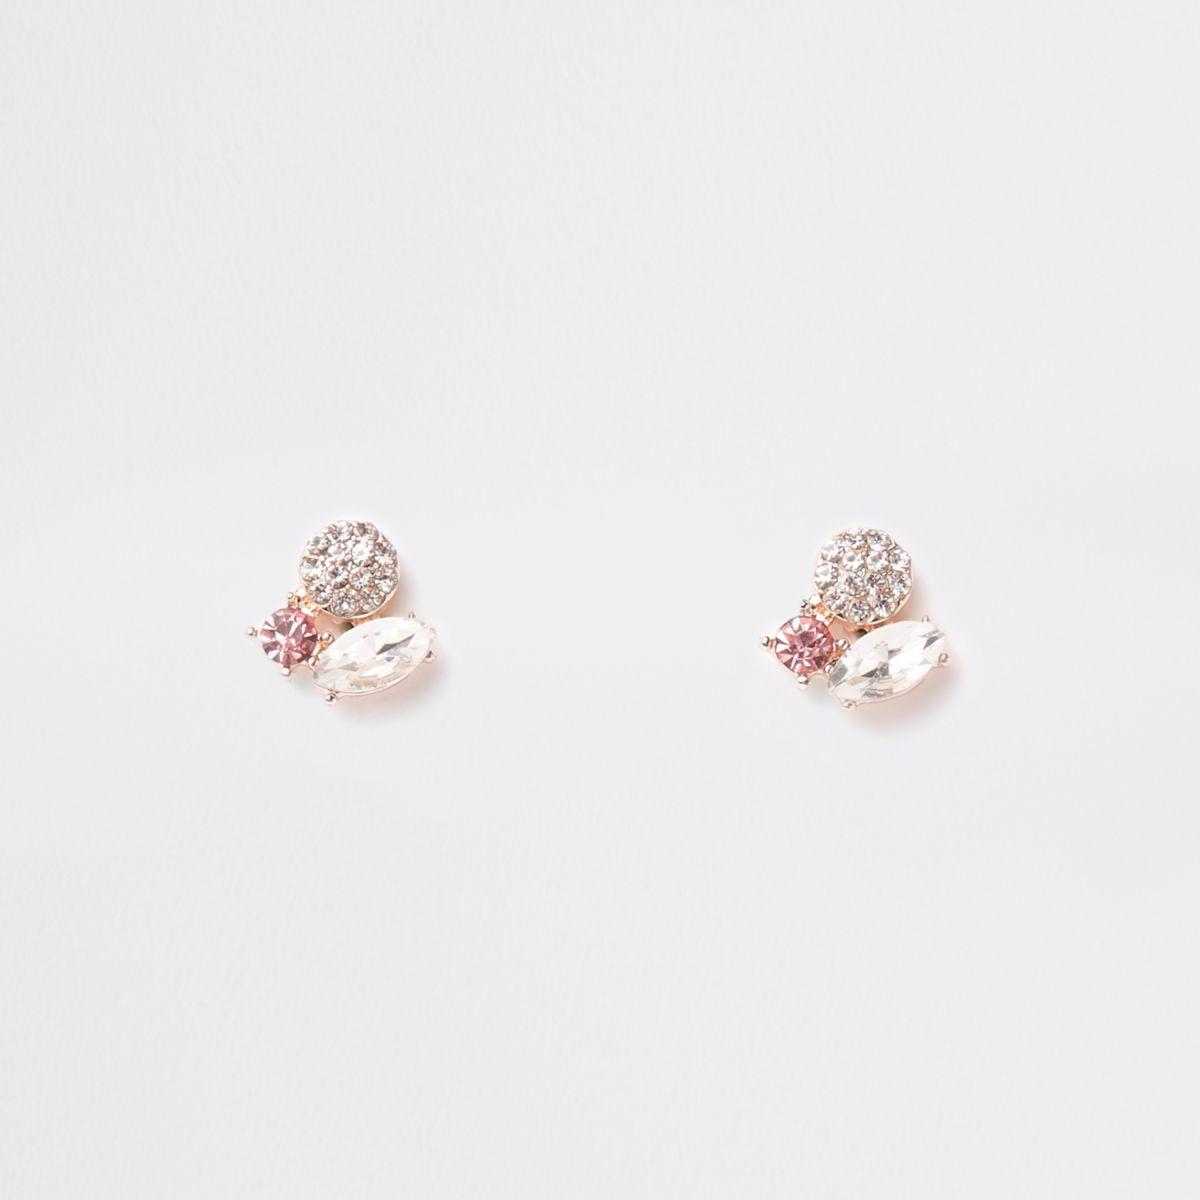 Rose gold tone three stone stud earring